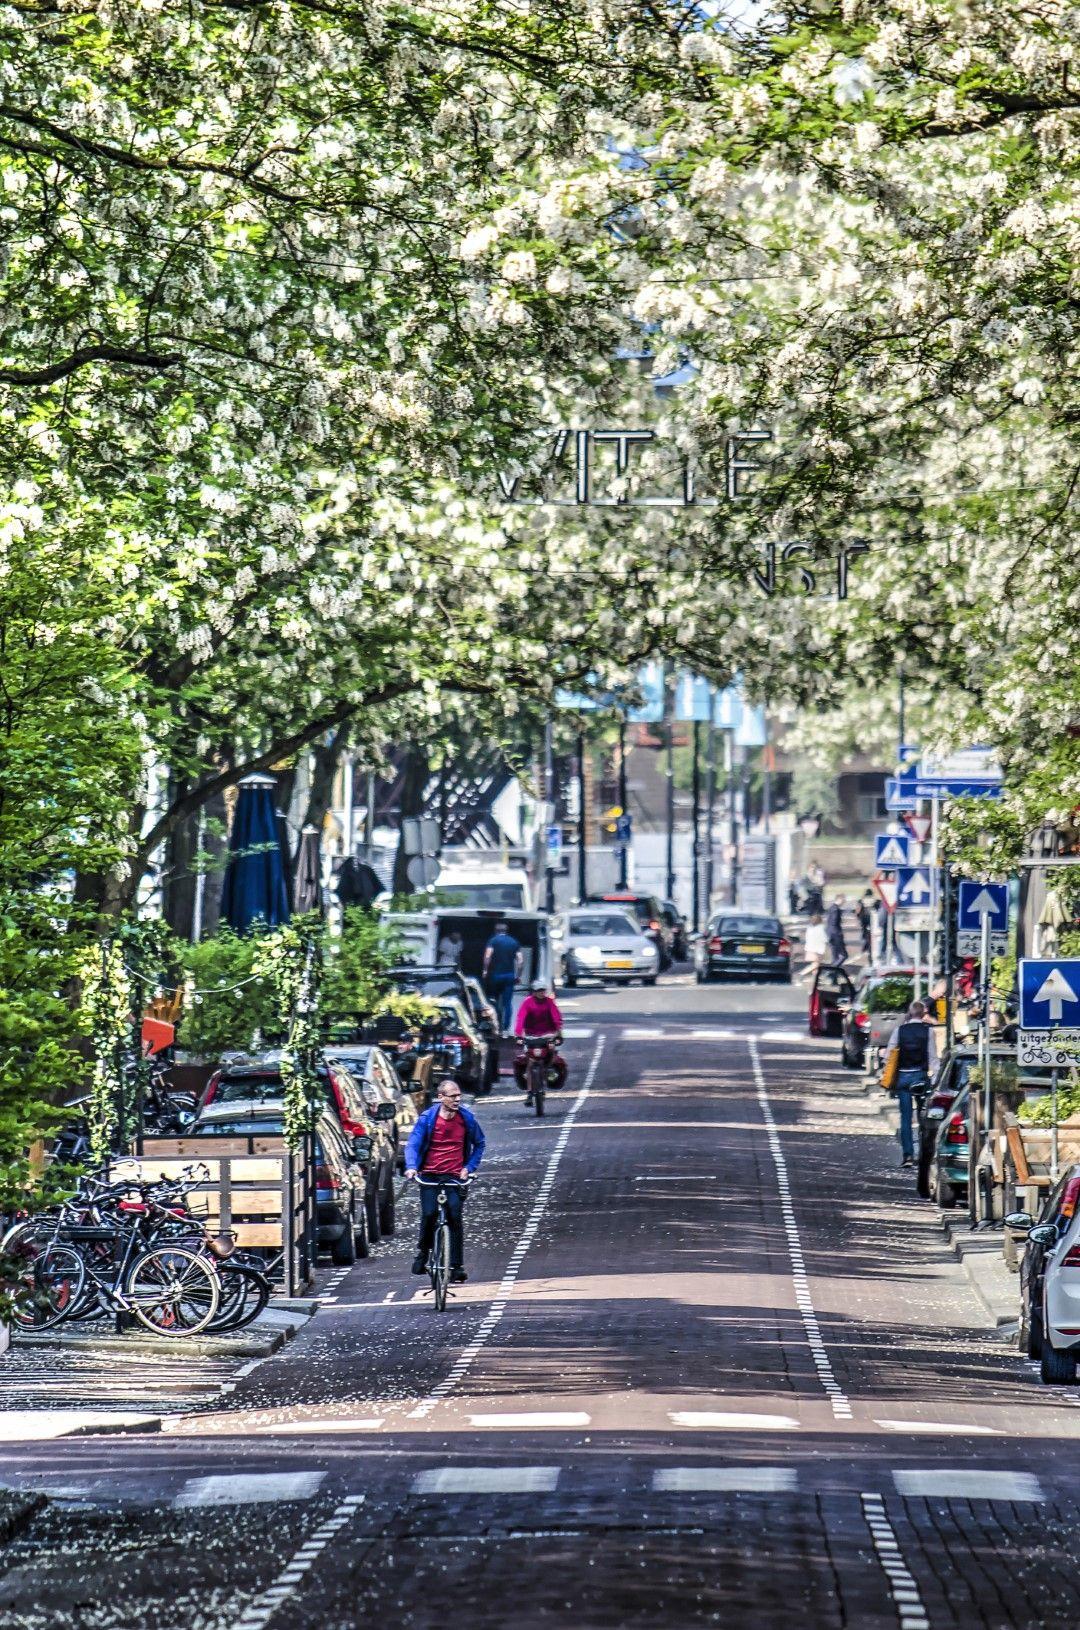 6. Witte de Withstraat, Ротердам, Нидерландия